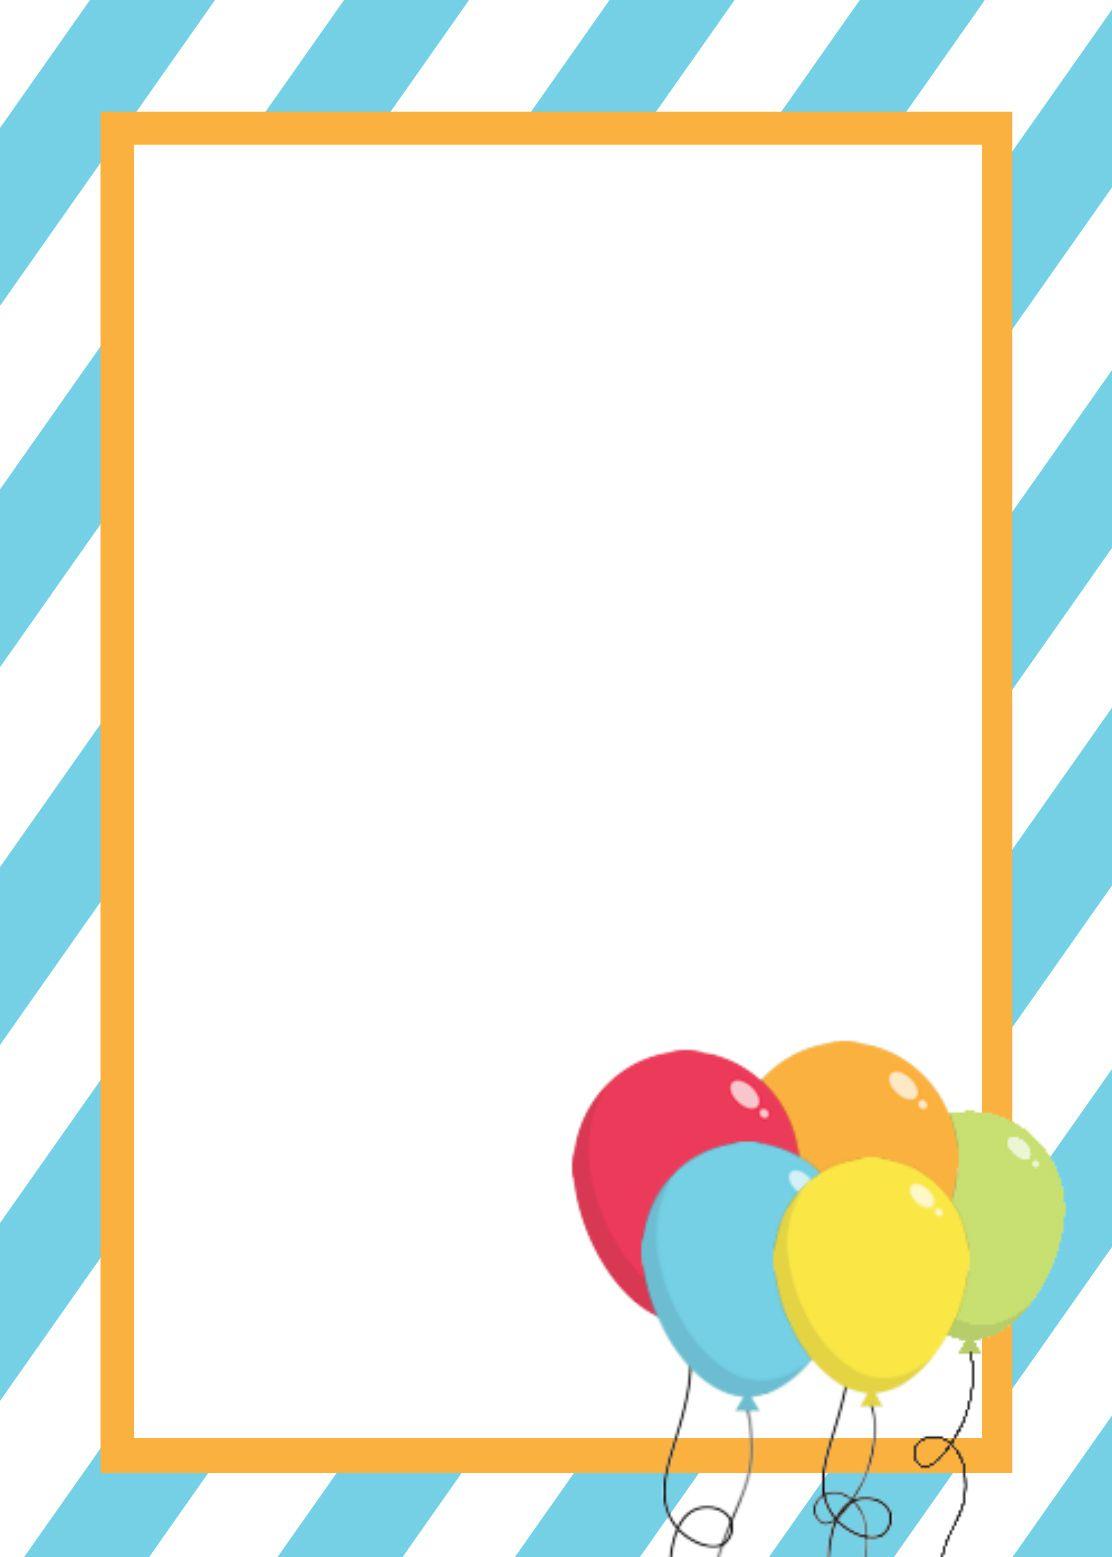 009 Astounding Party Invitation Template Word Image  Tea Retirement M Free Christma MicrosoftFull